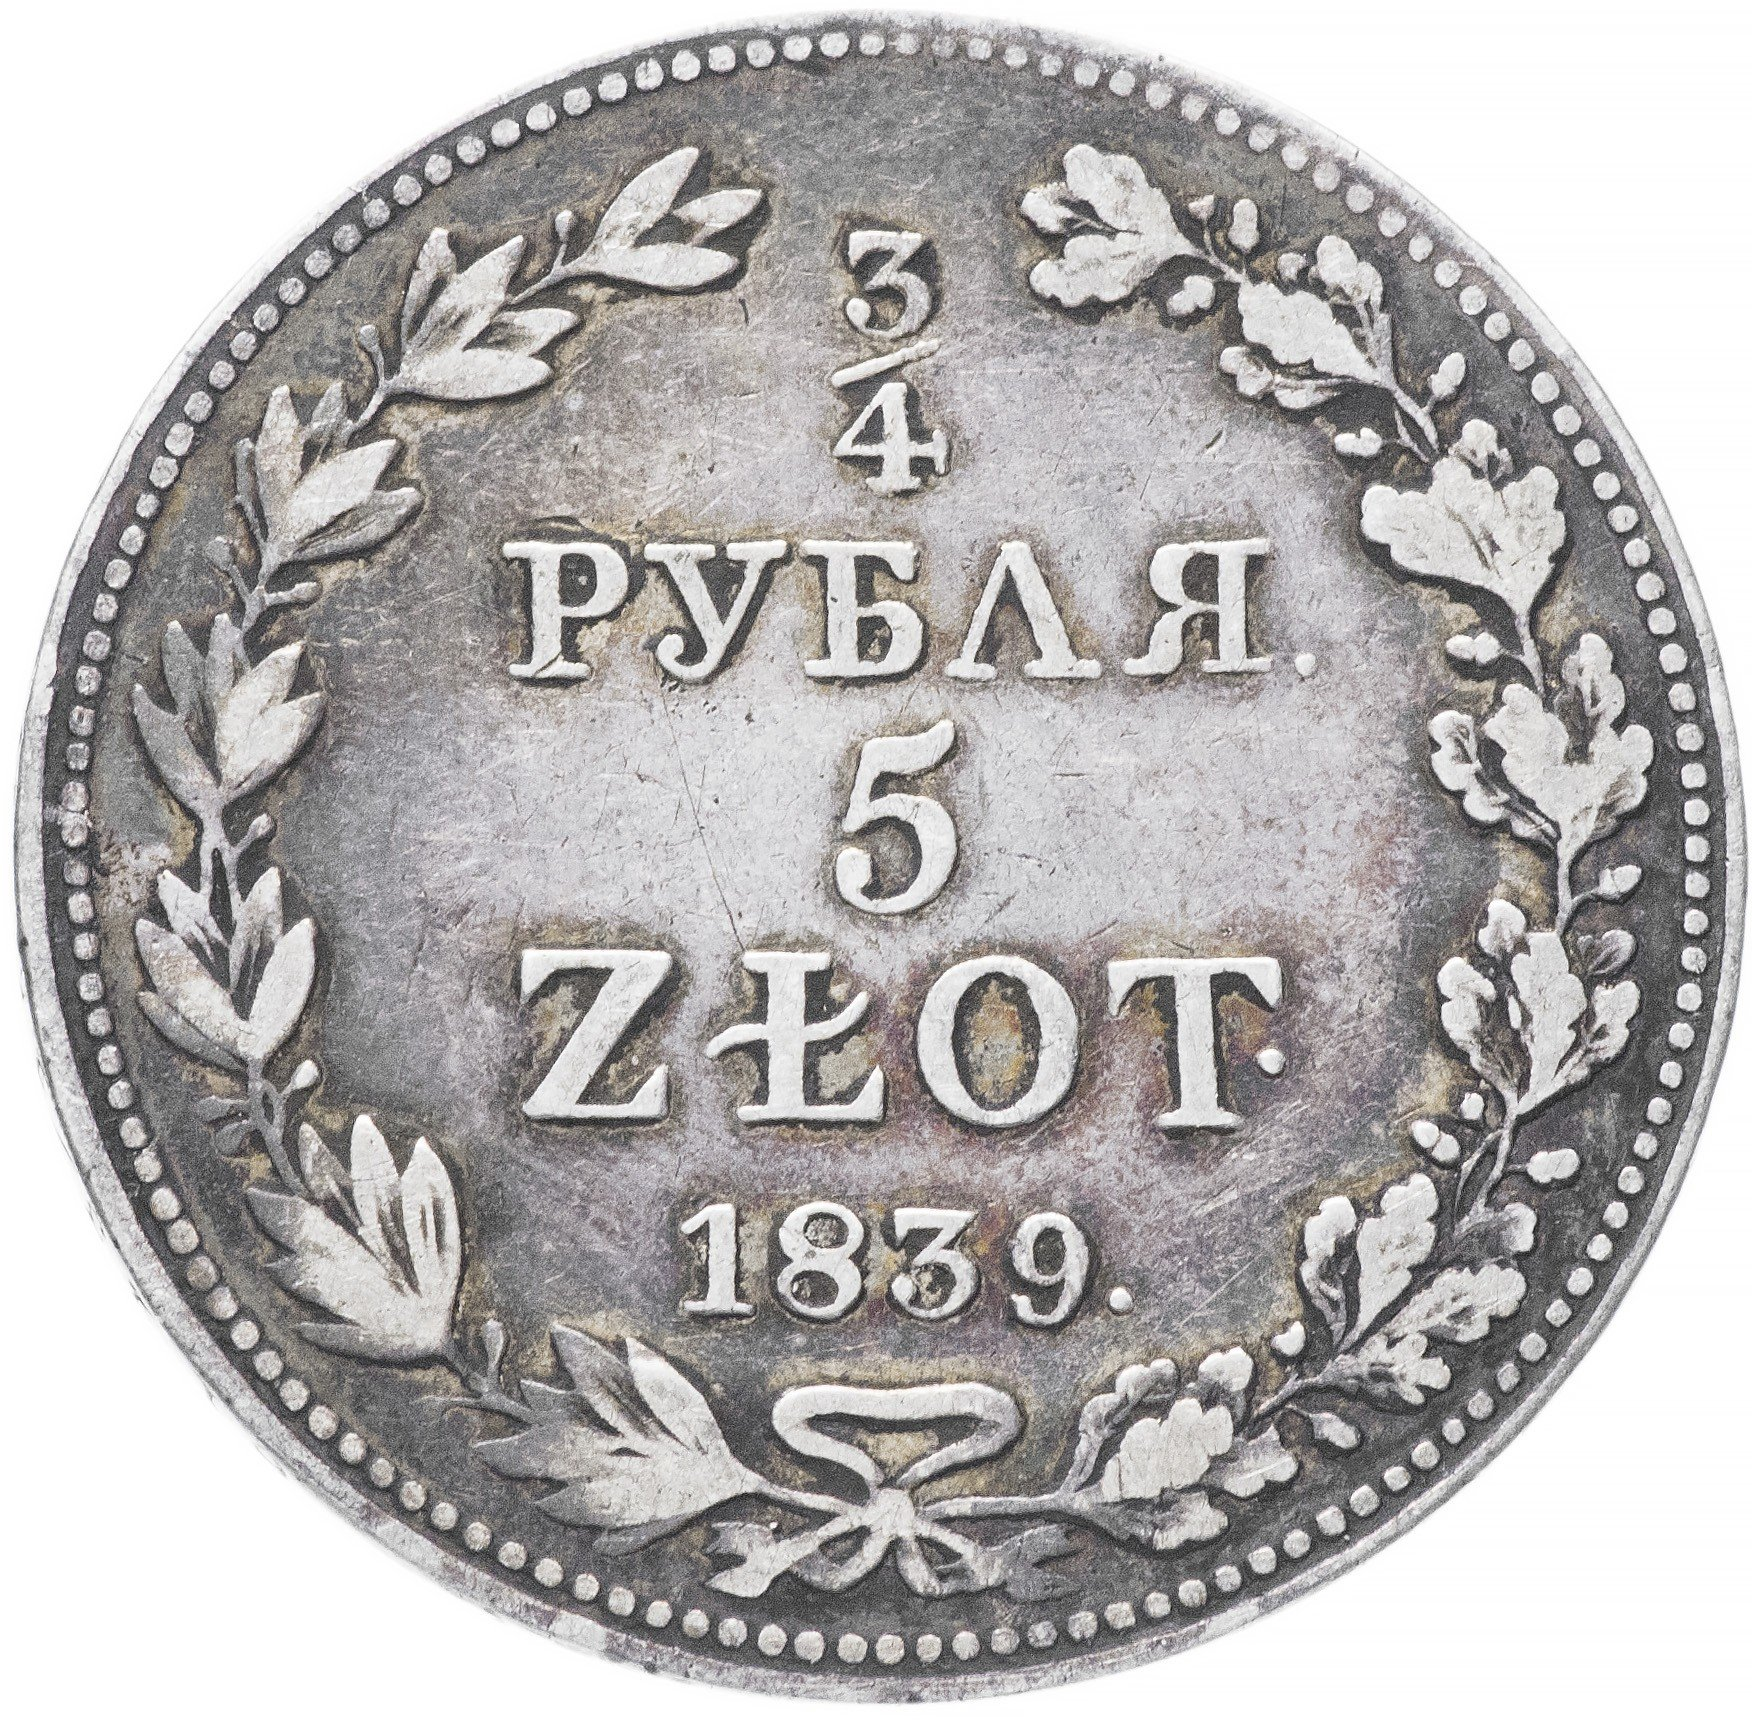 5 злотых 1839 го финд 40